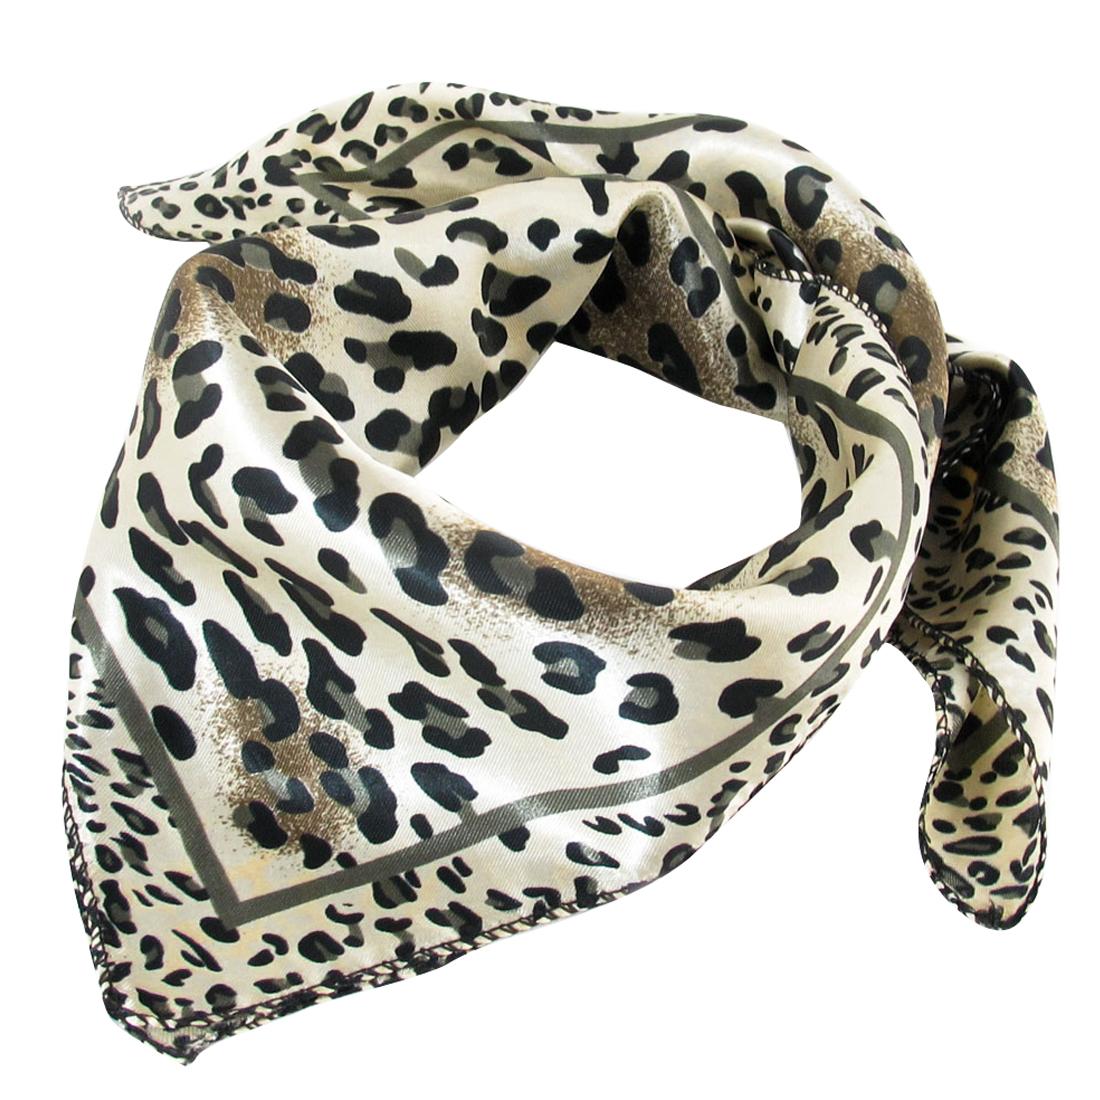 "Khaki Leopard Pattern 20.5"" x 20.5"" Square Kerchief Neckerchief Scarf"